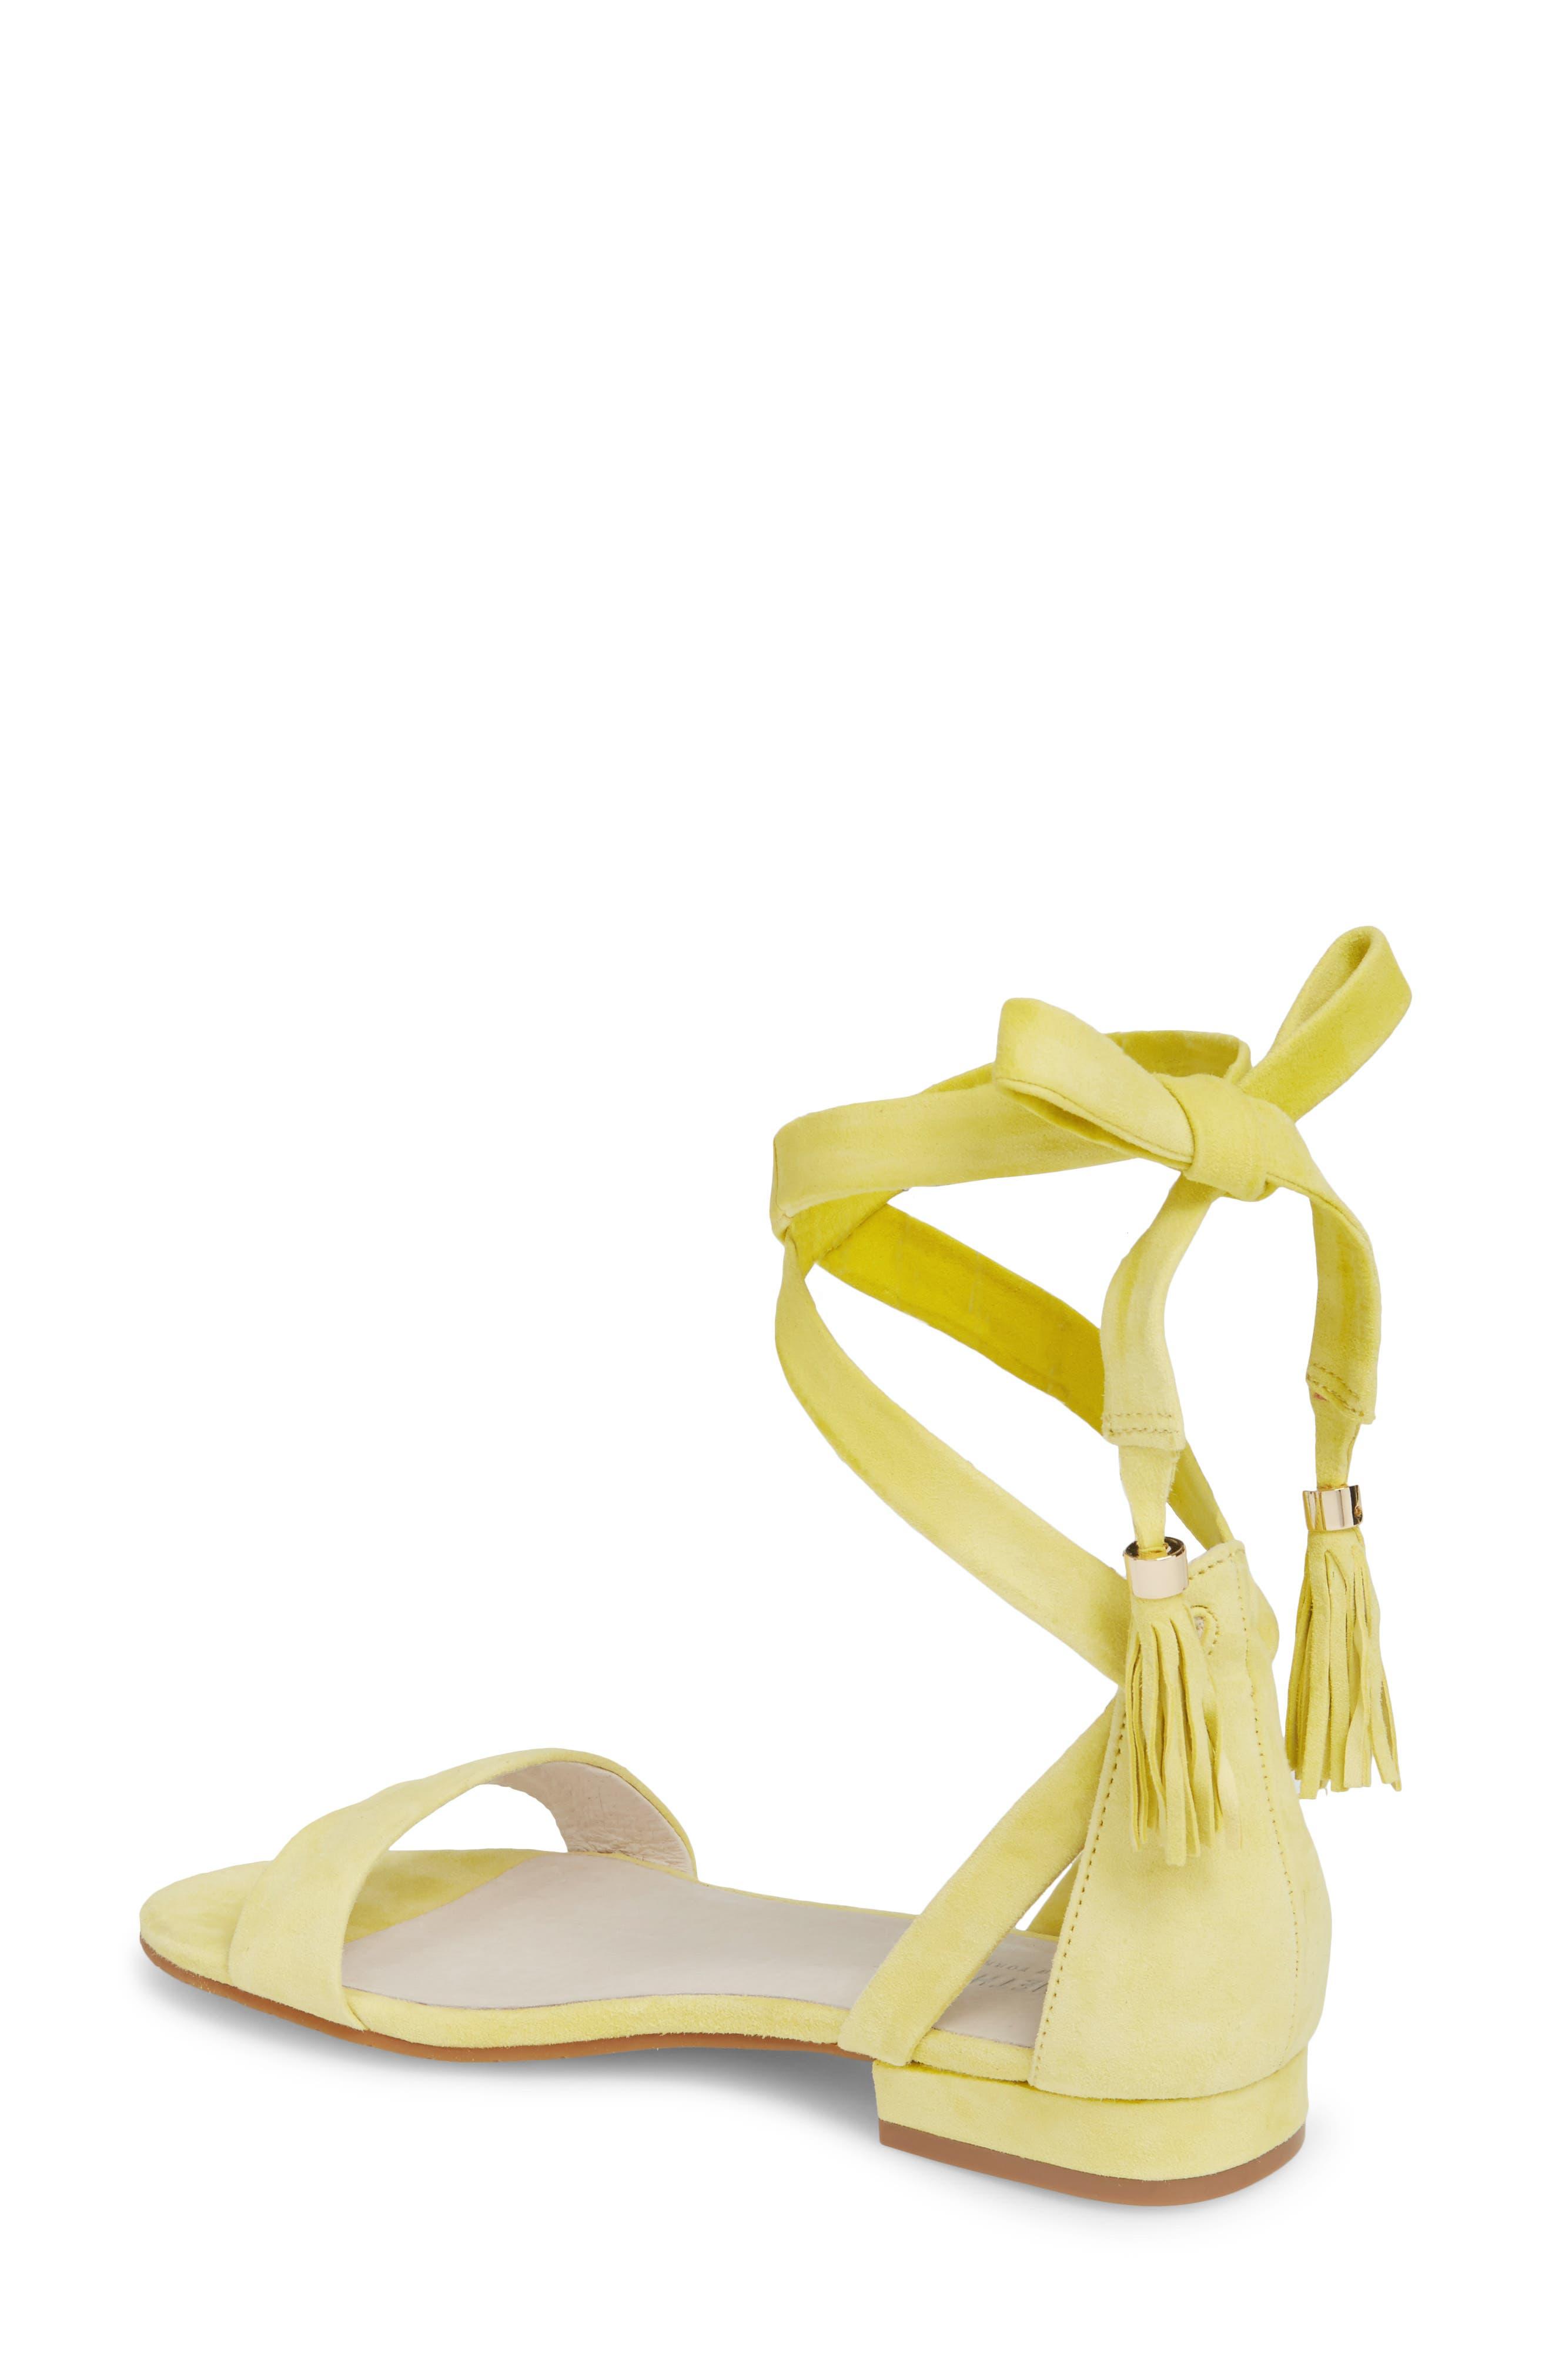 Valen Tassel Lace-Up Sandal,                             Alternate thumbnail 16, color,